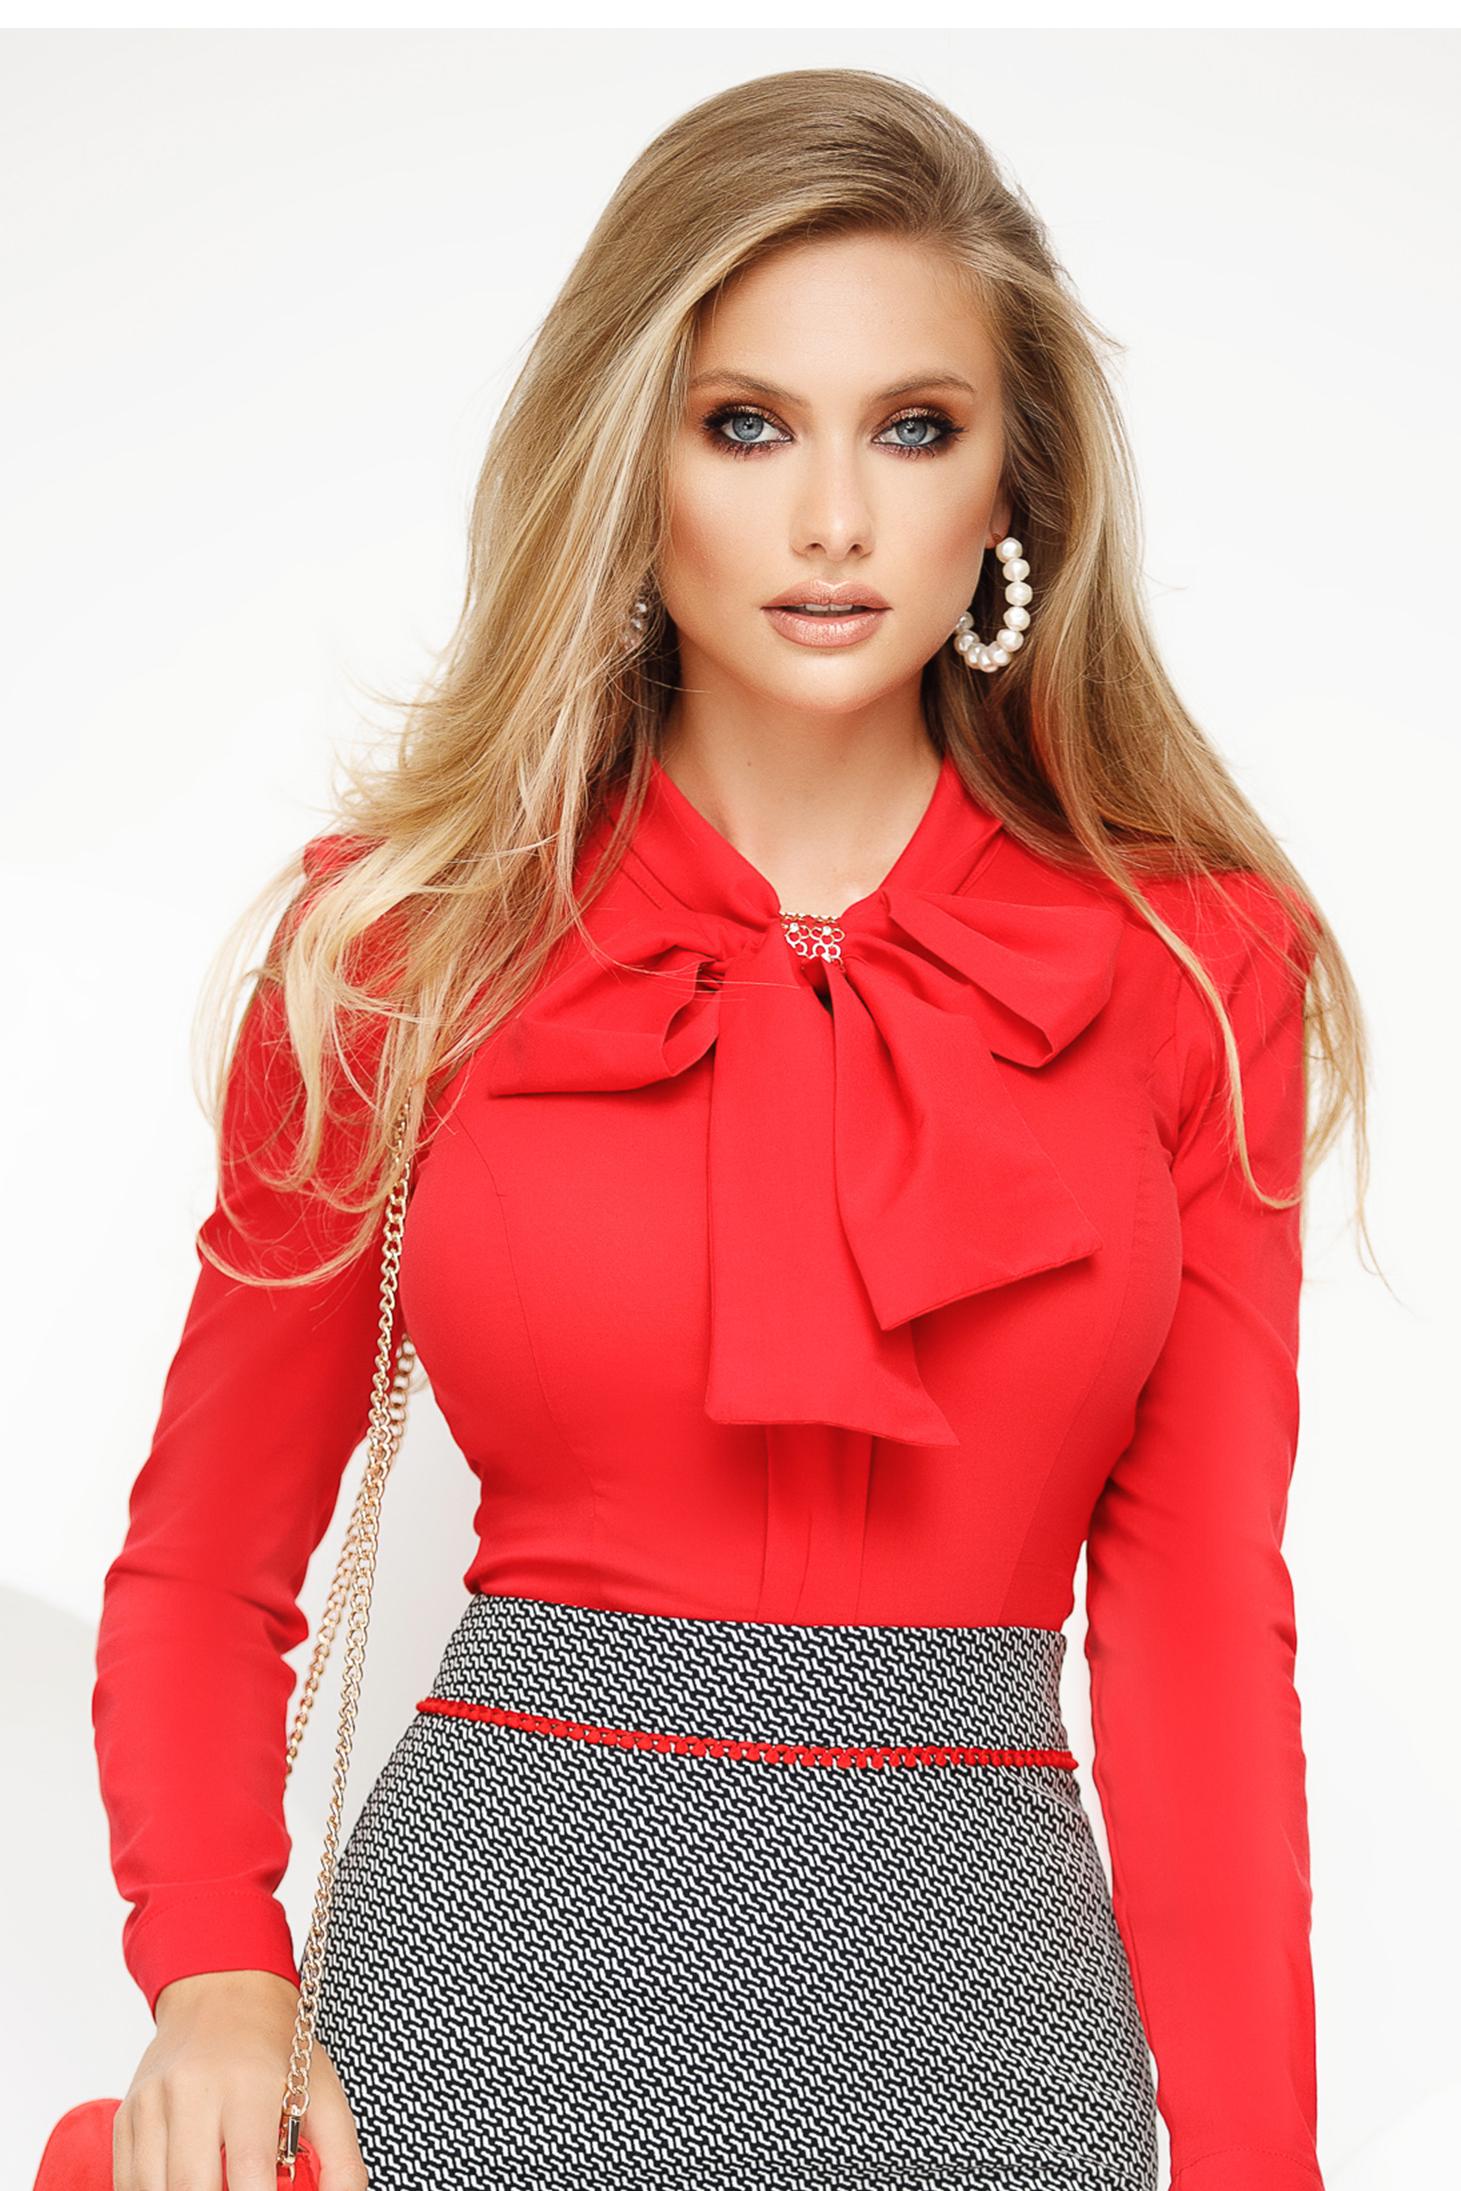 Camasa dama Fofy rosie office din bumbac usor elastic cu un croi mulat si fundita